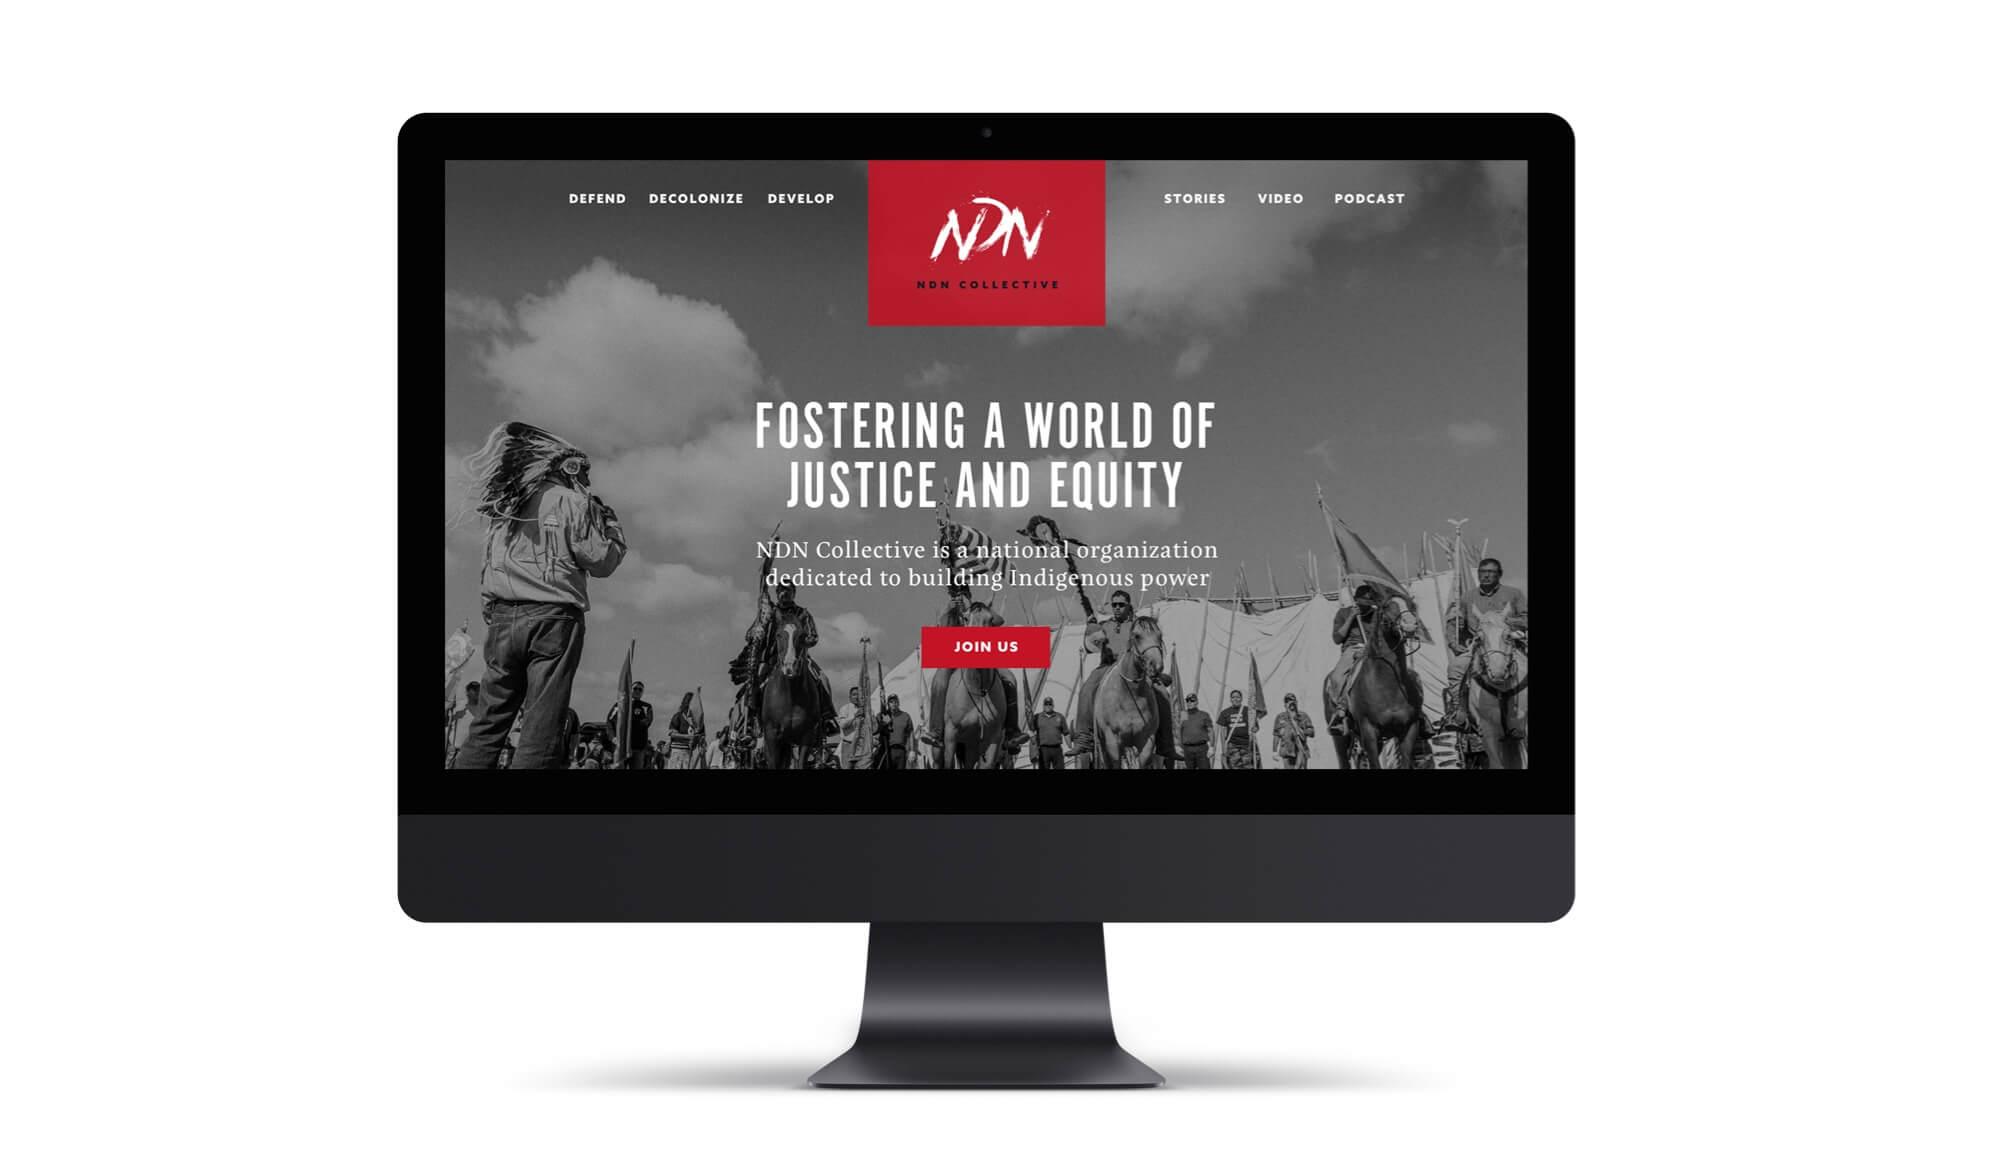 imac mock up of ndn website